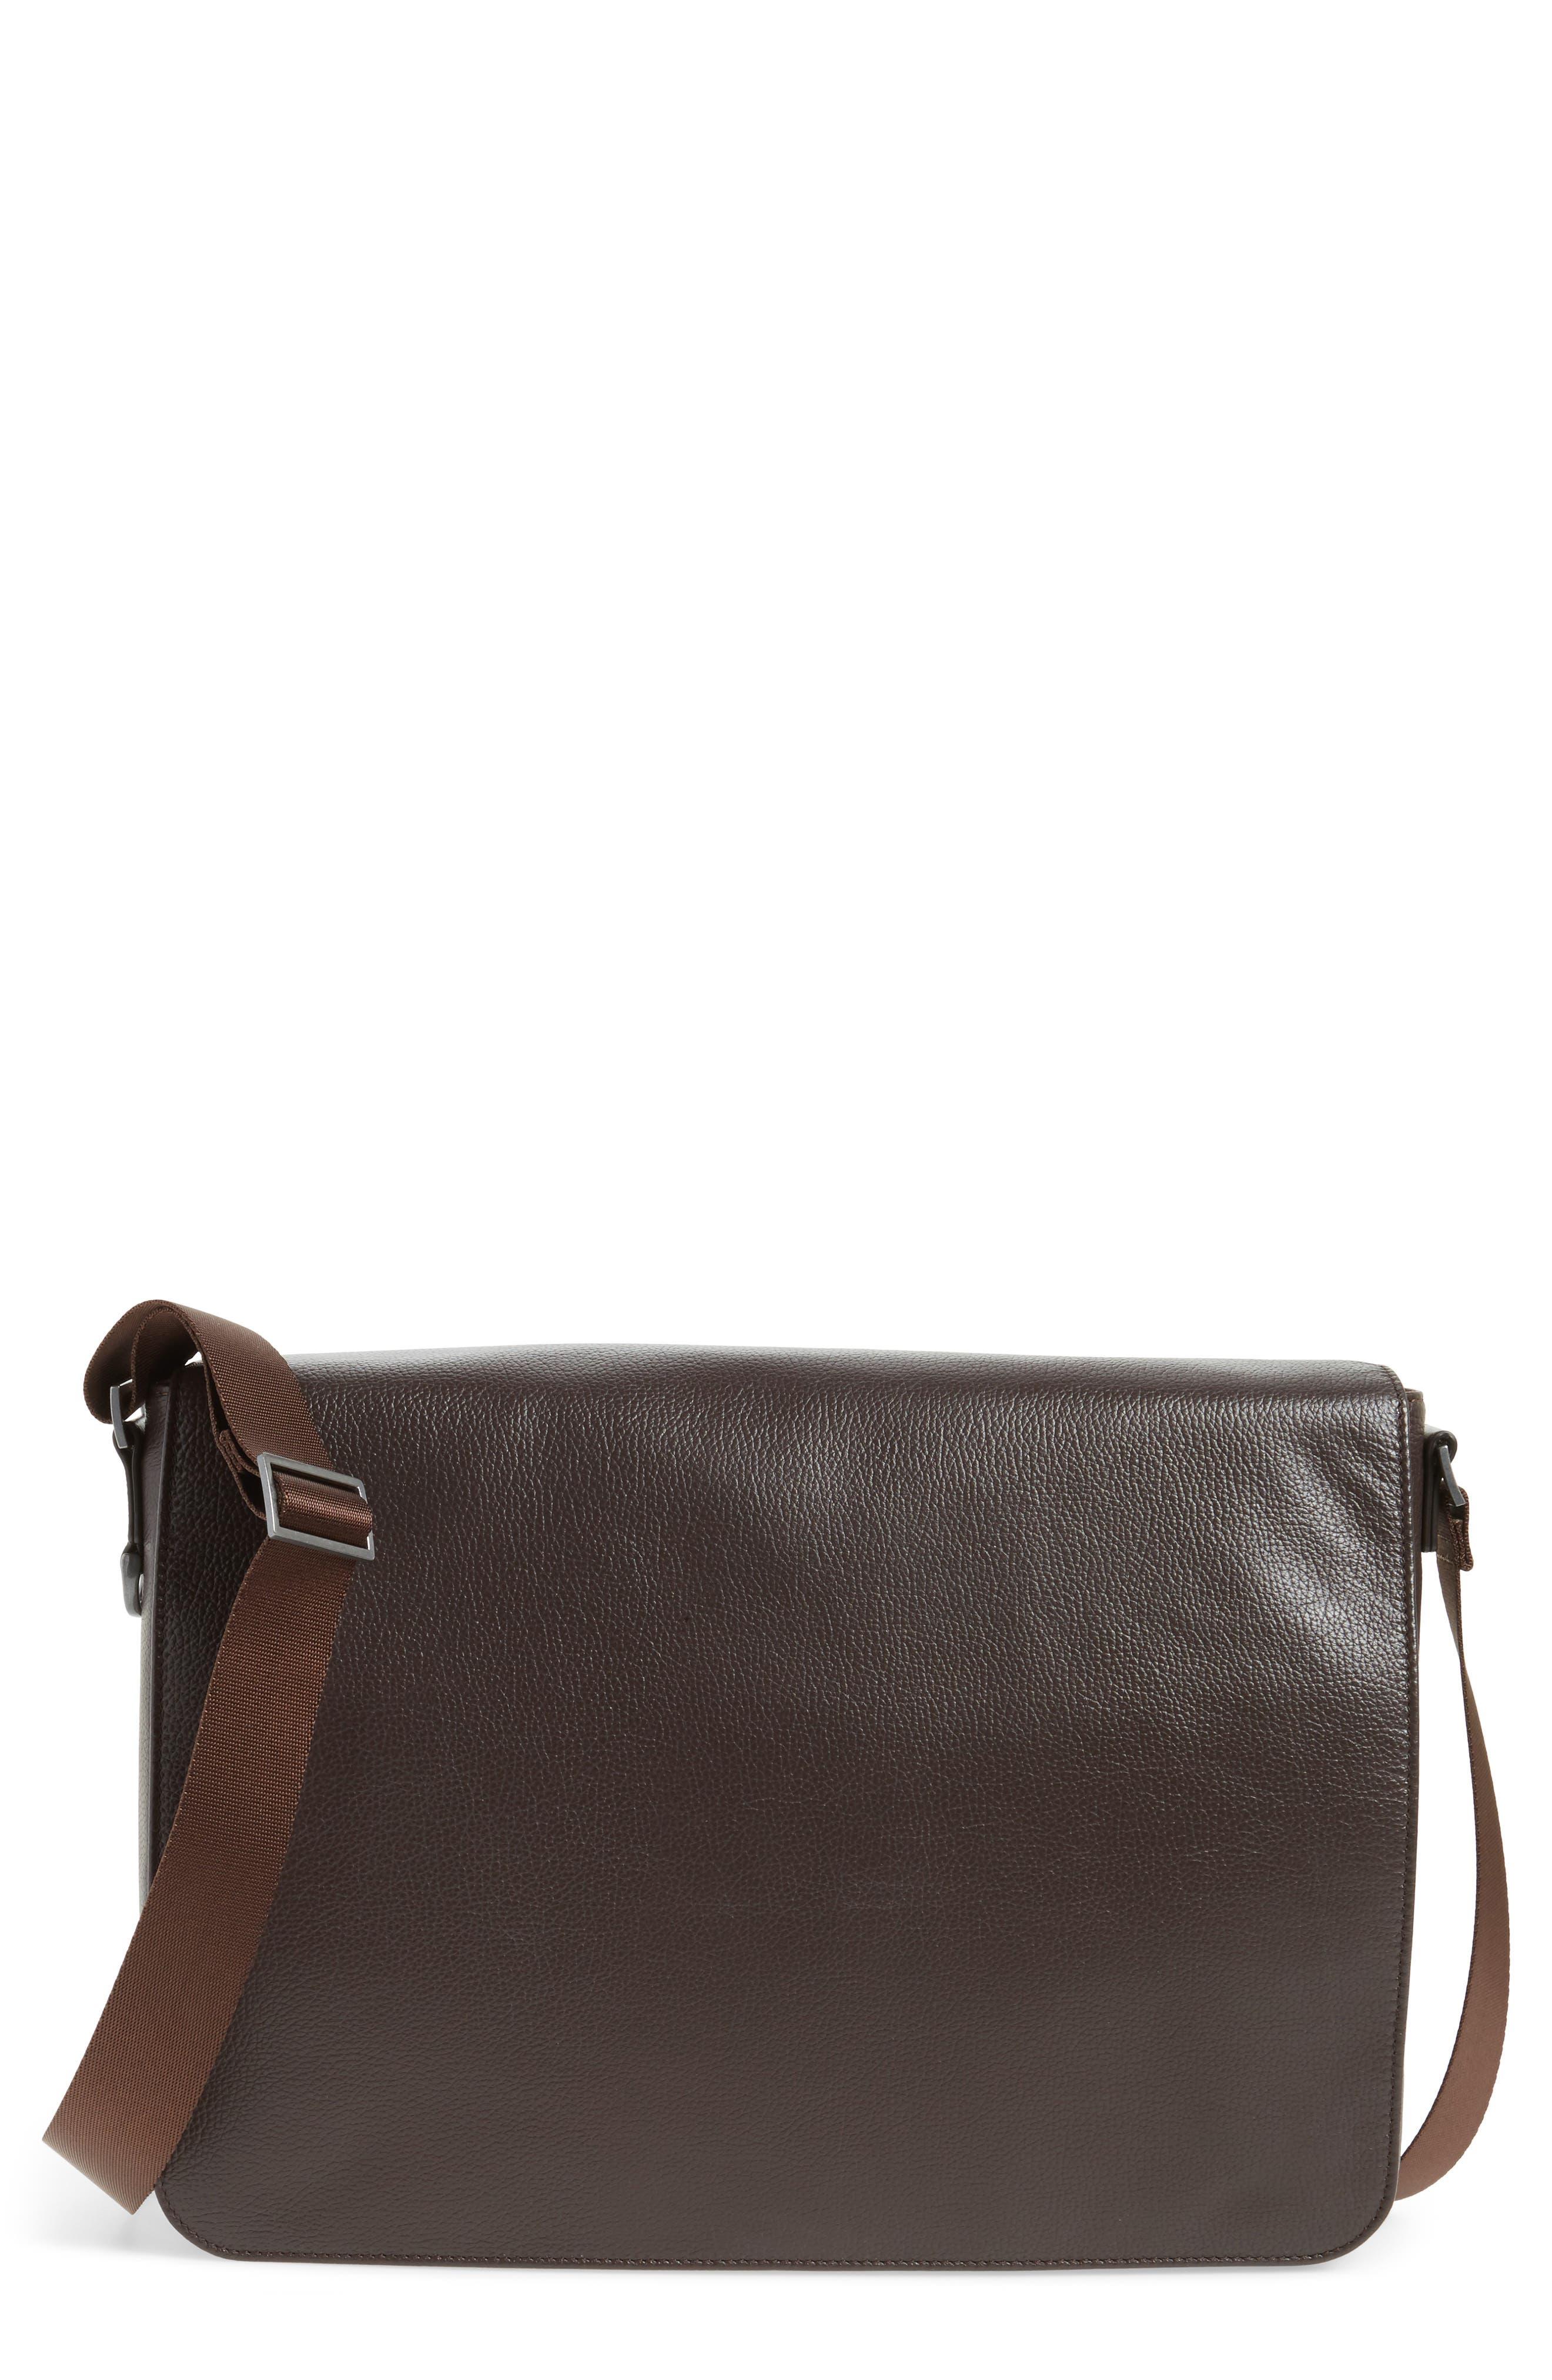 Midland Leather Messenger Bag,                             Main thumbnail 1, color,                             Brown